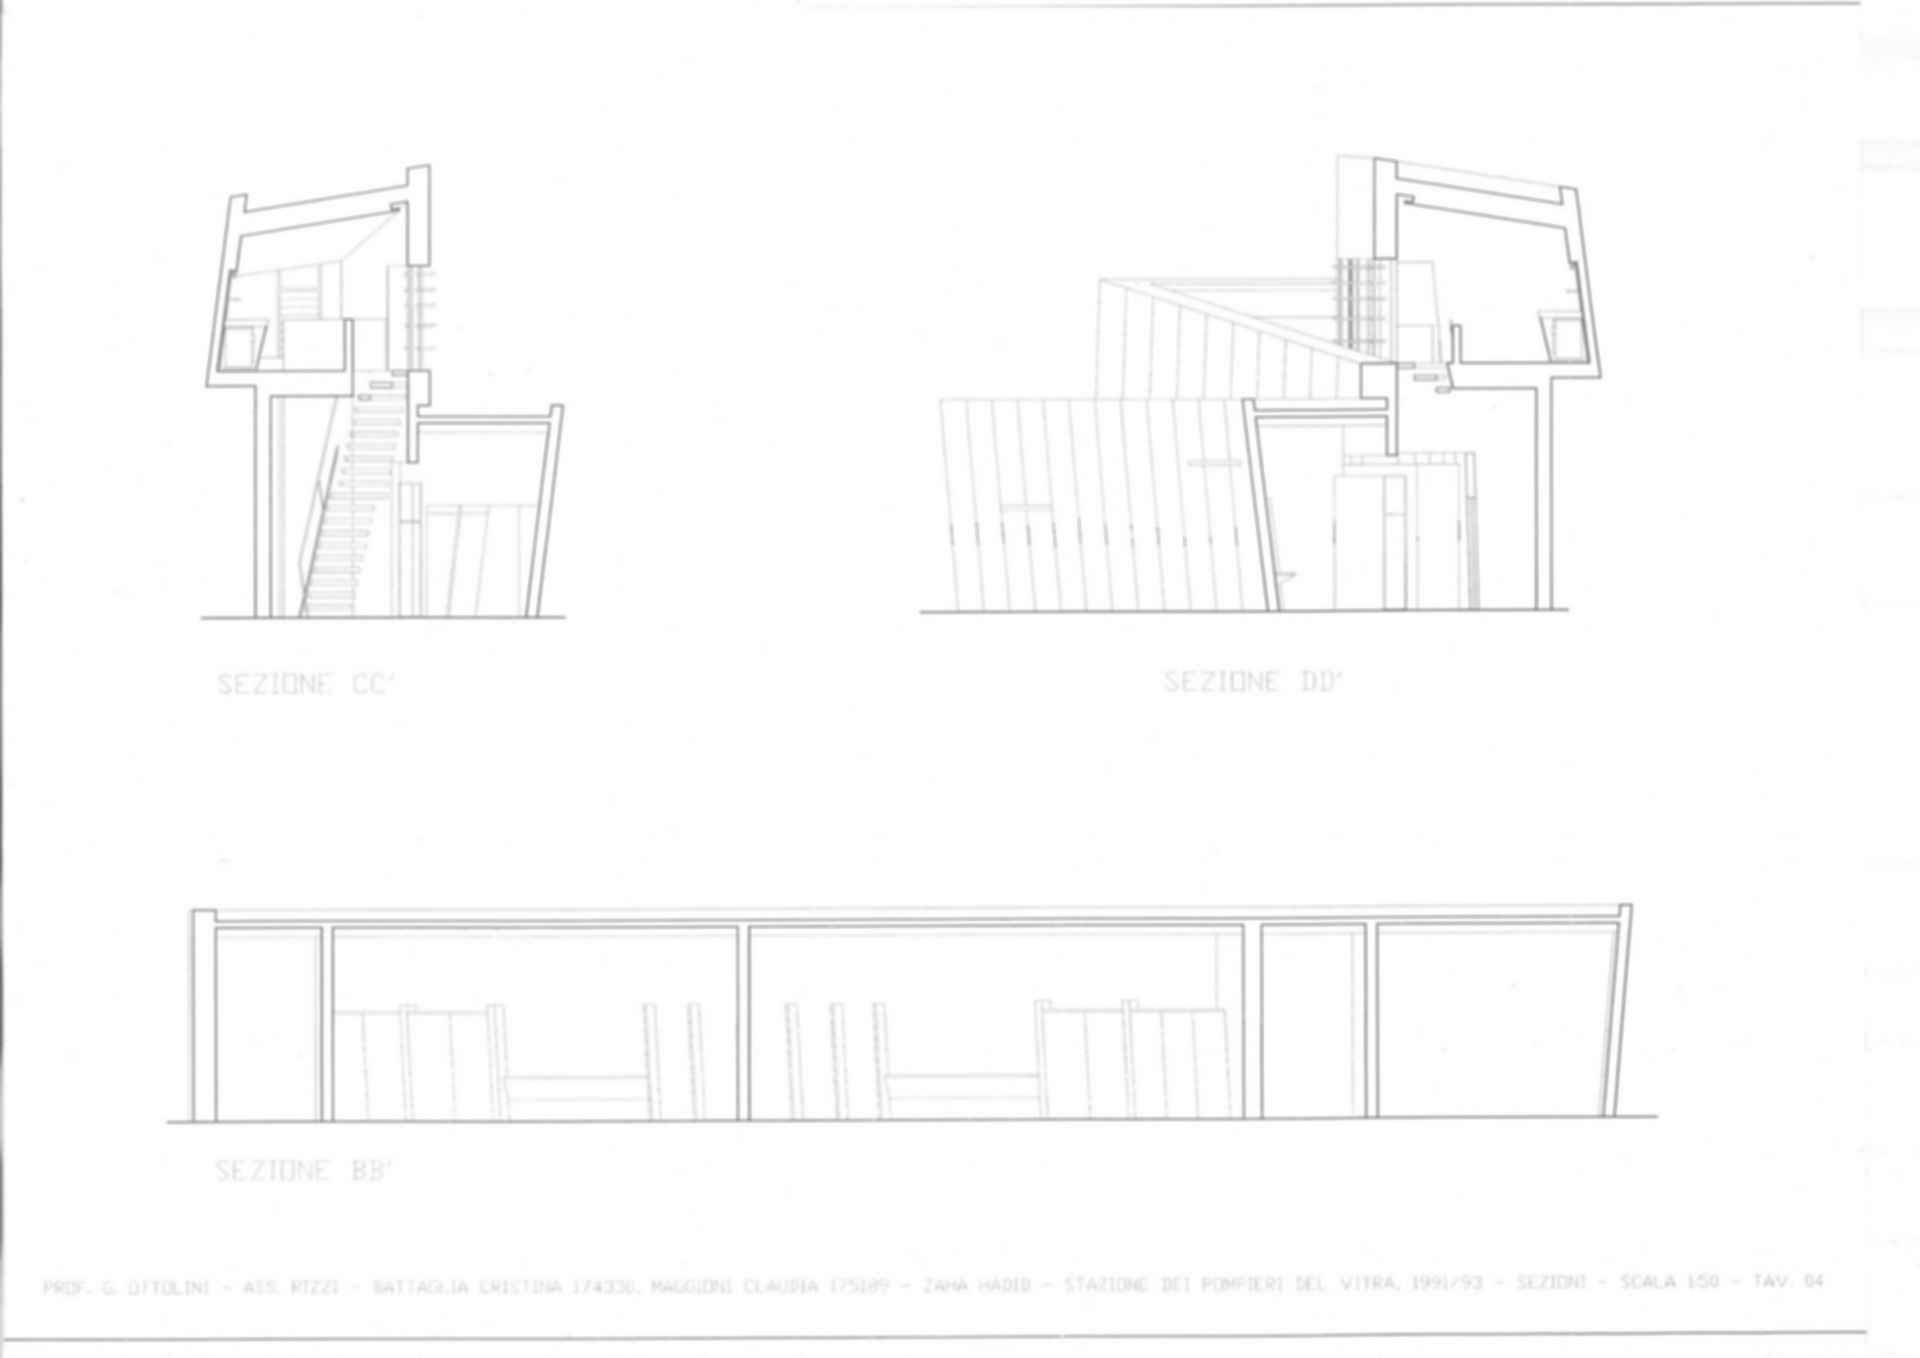 Vitra Fire Station - Concept Design